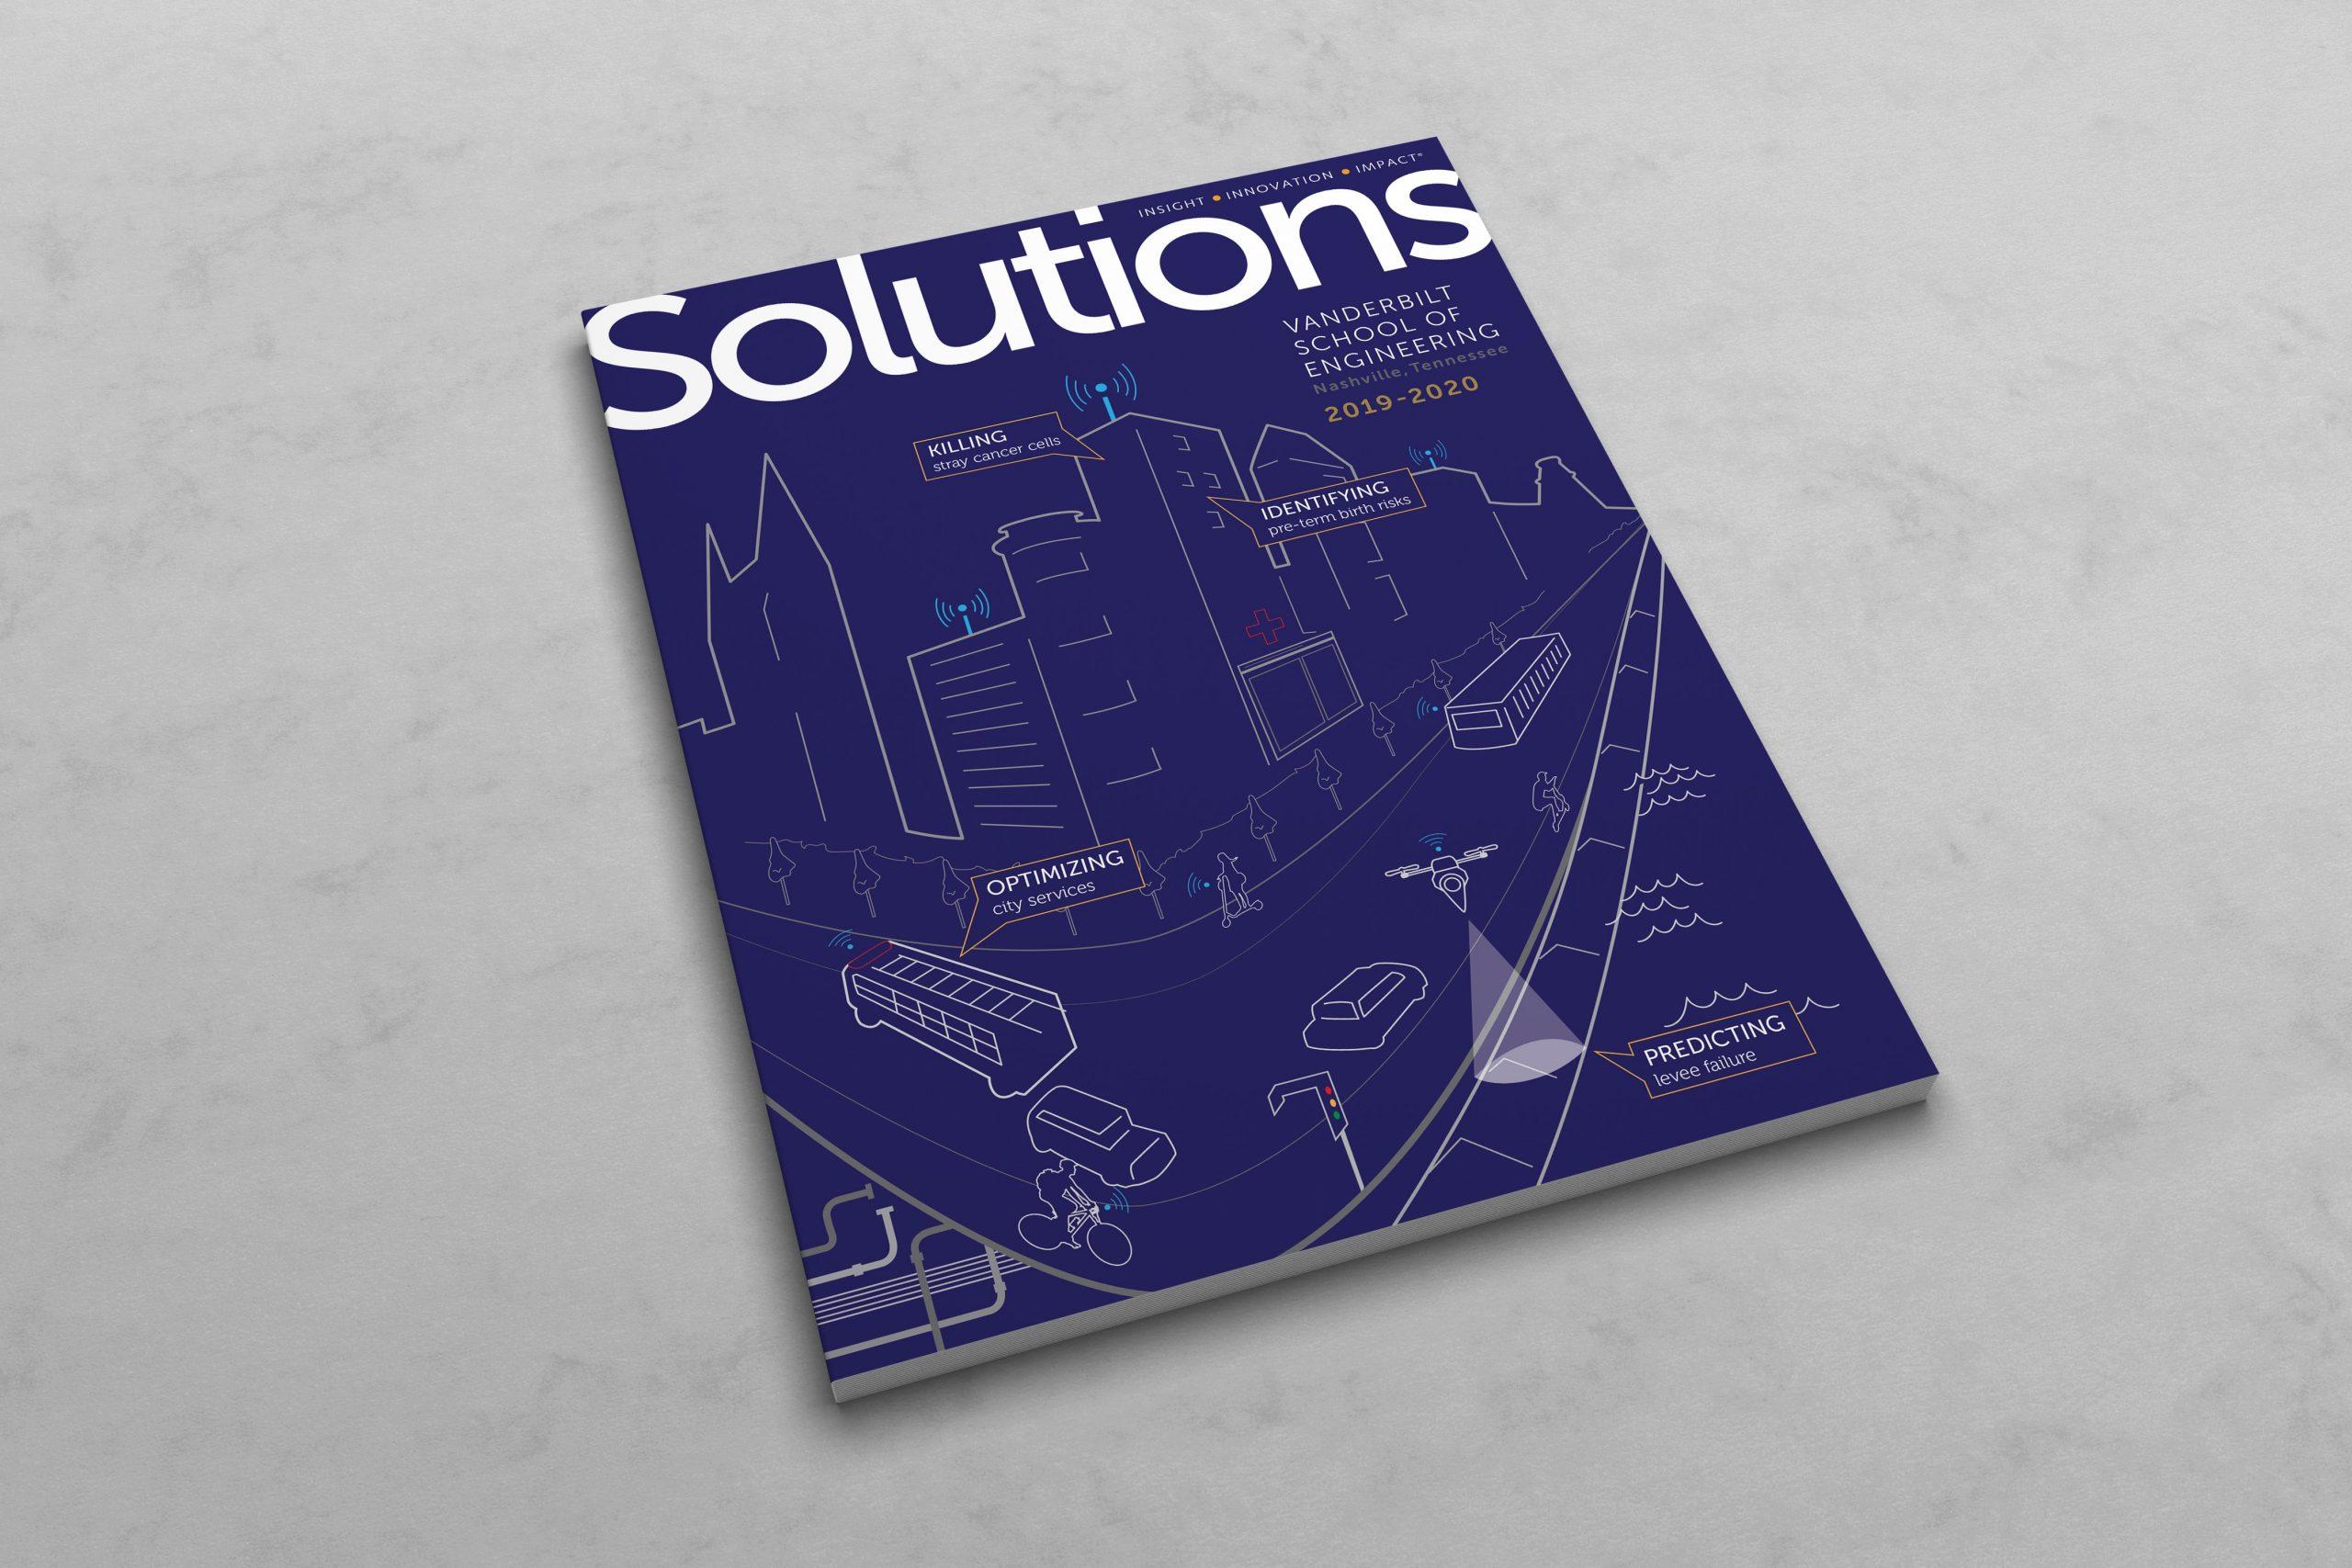 Vanderbilt University Solutions Magazine Cover Illustration 2019